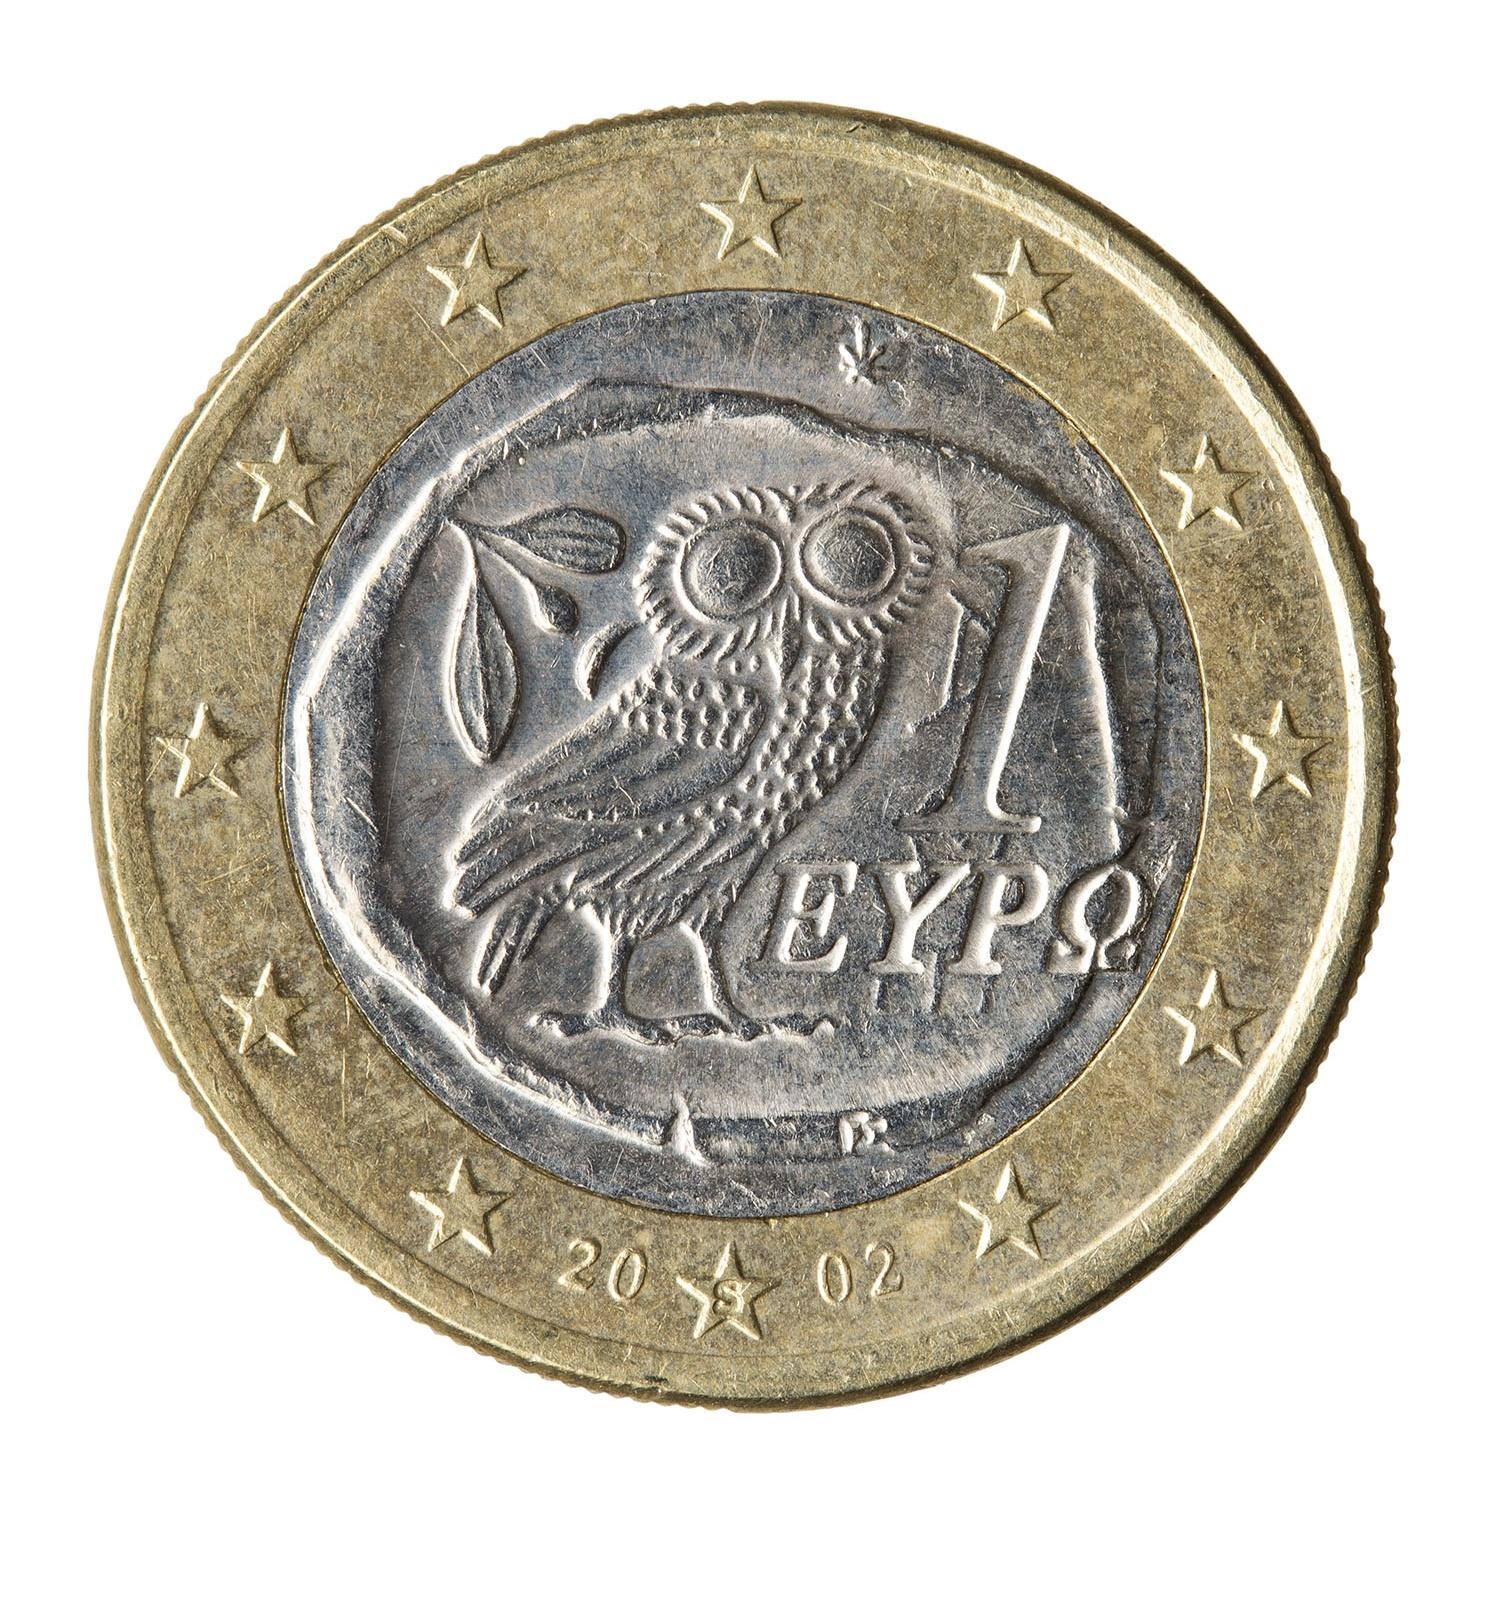 Unió Europea/República Hel·lènica, 1 euro, 2002. MNAC/GNC 306661